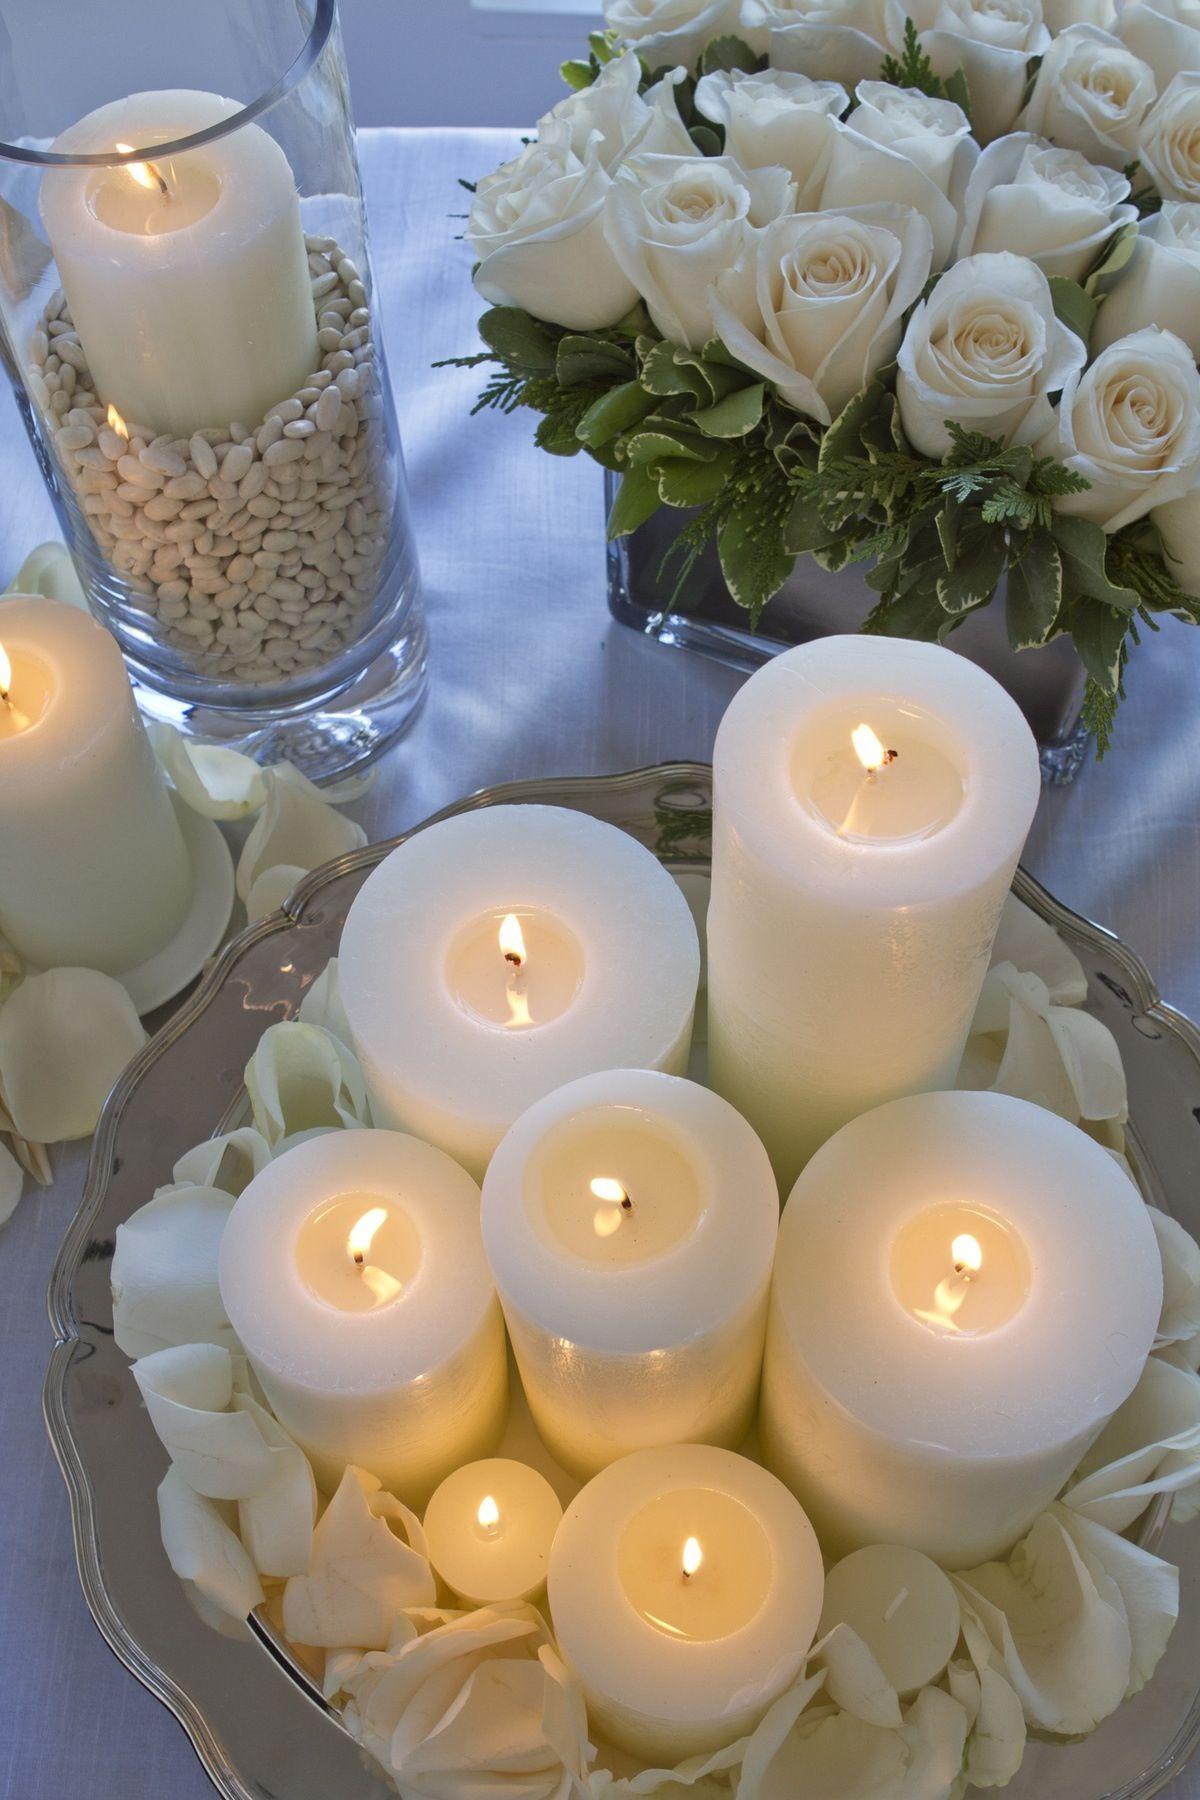 white roses candles wedding tablescapes pinterest. Black Bedroom Furniture Sets. Home Design Ideas